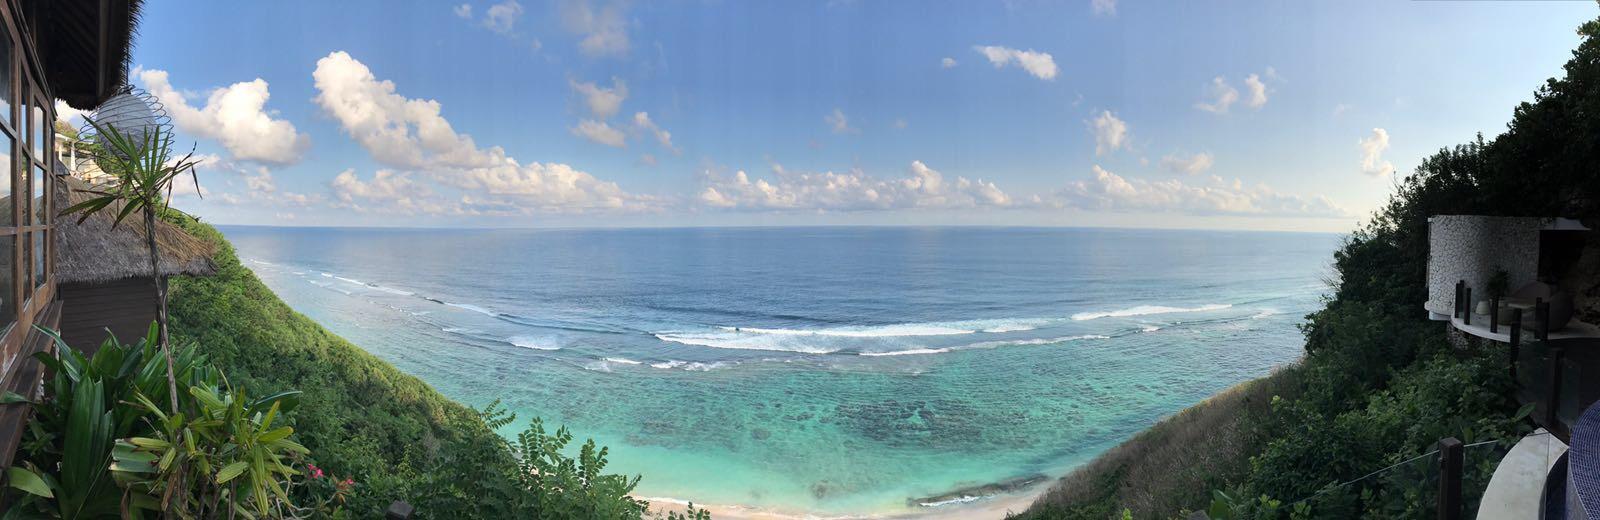 bali, Indonesia - 2017